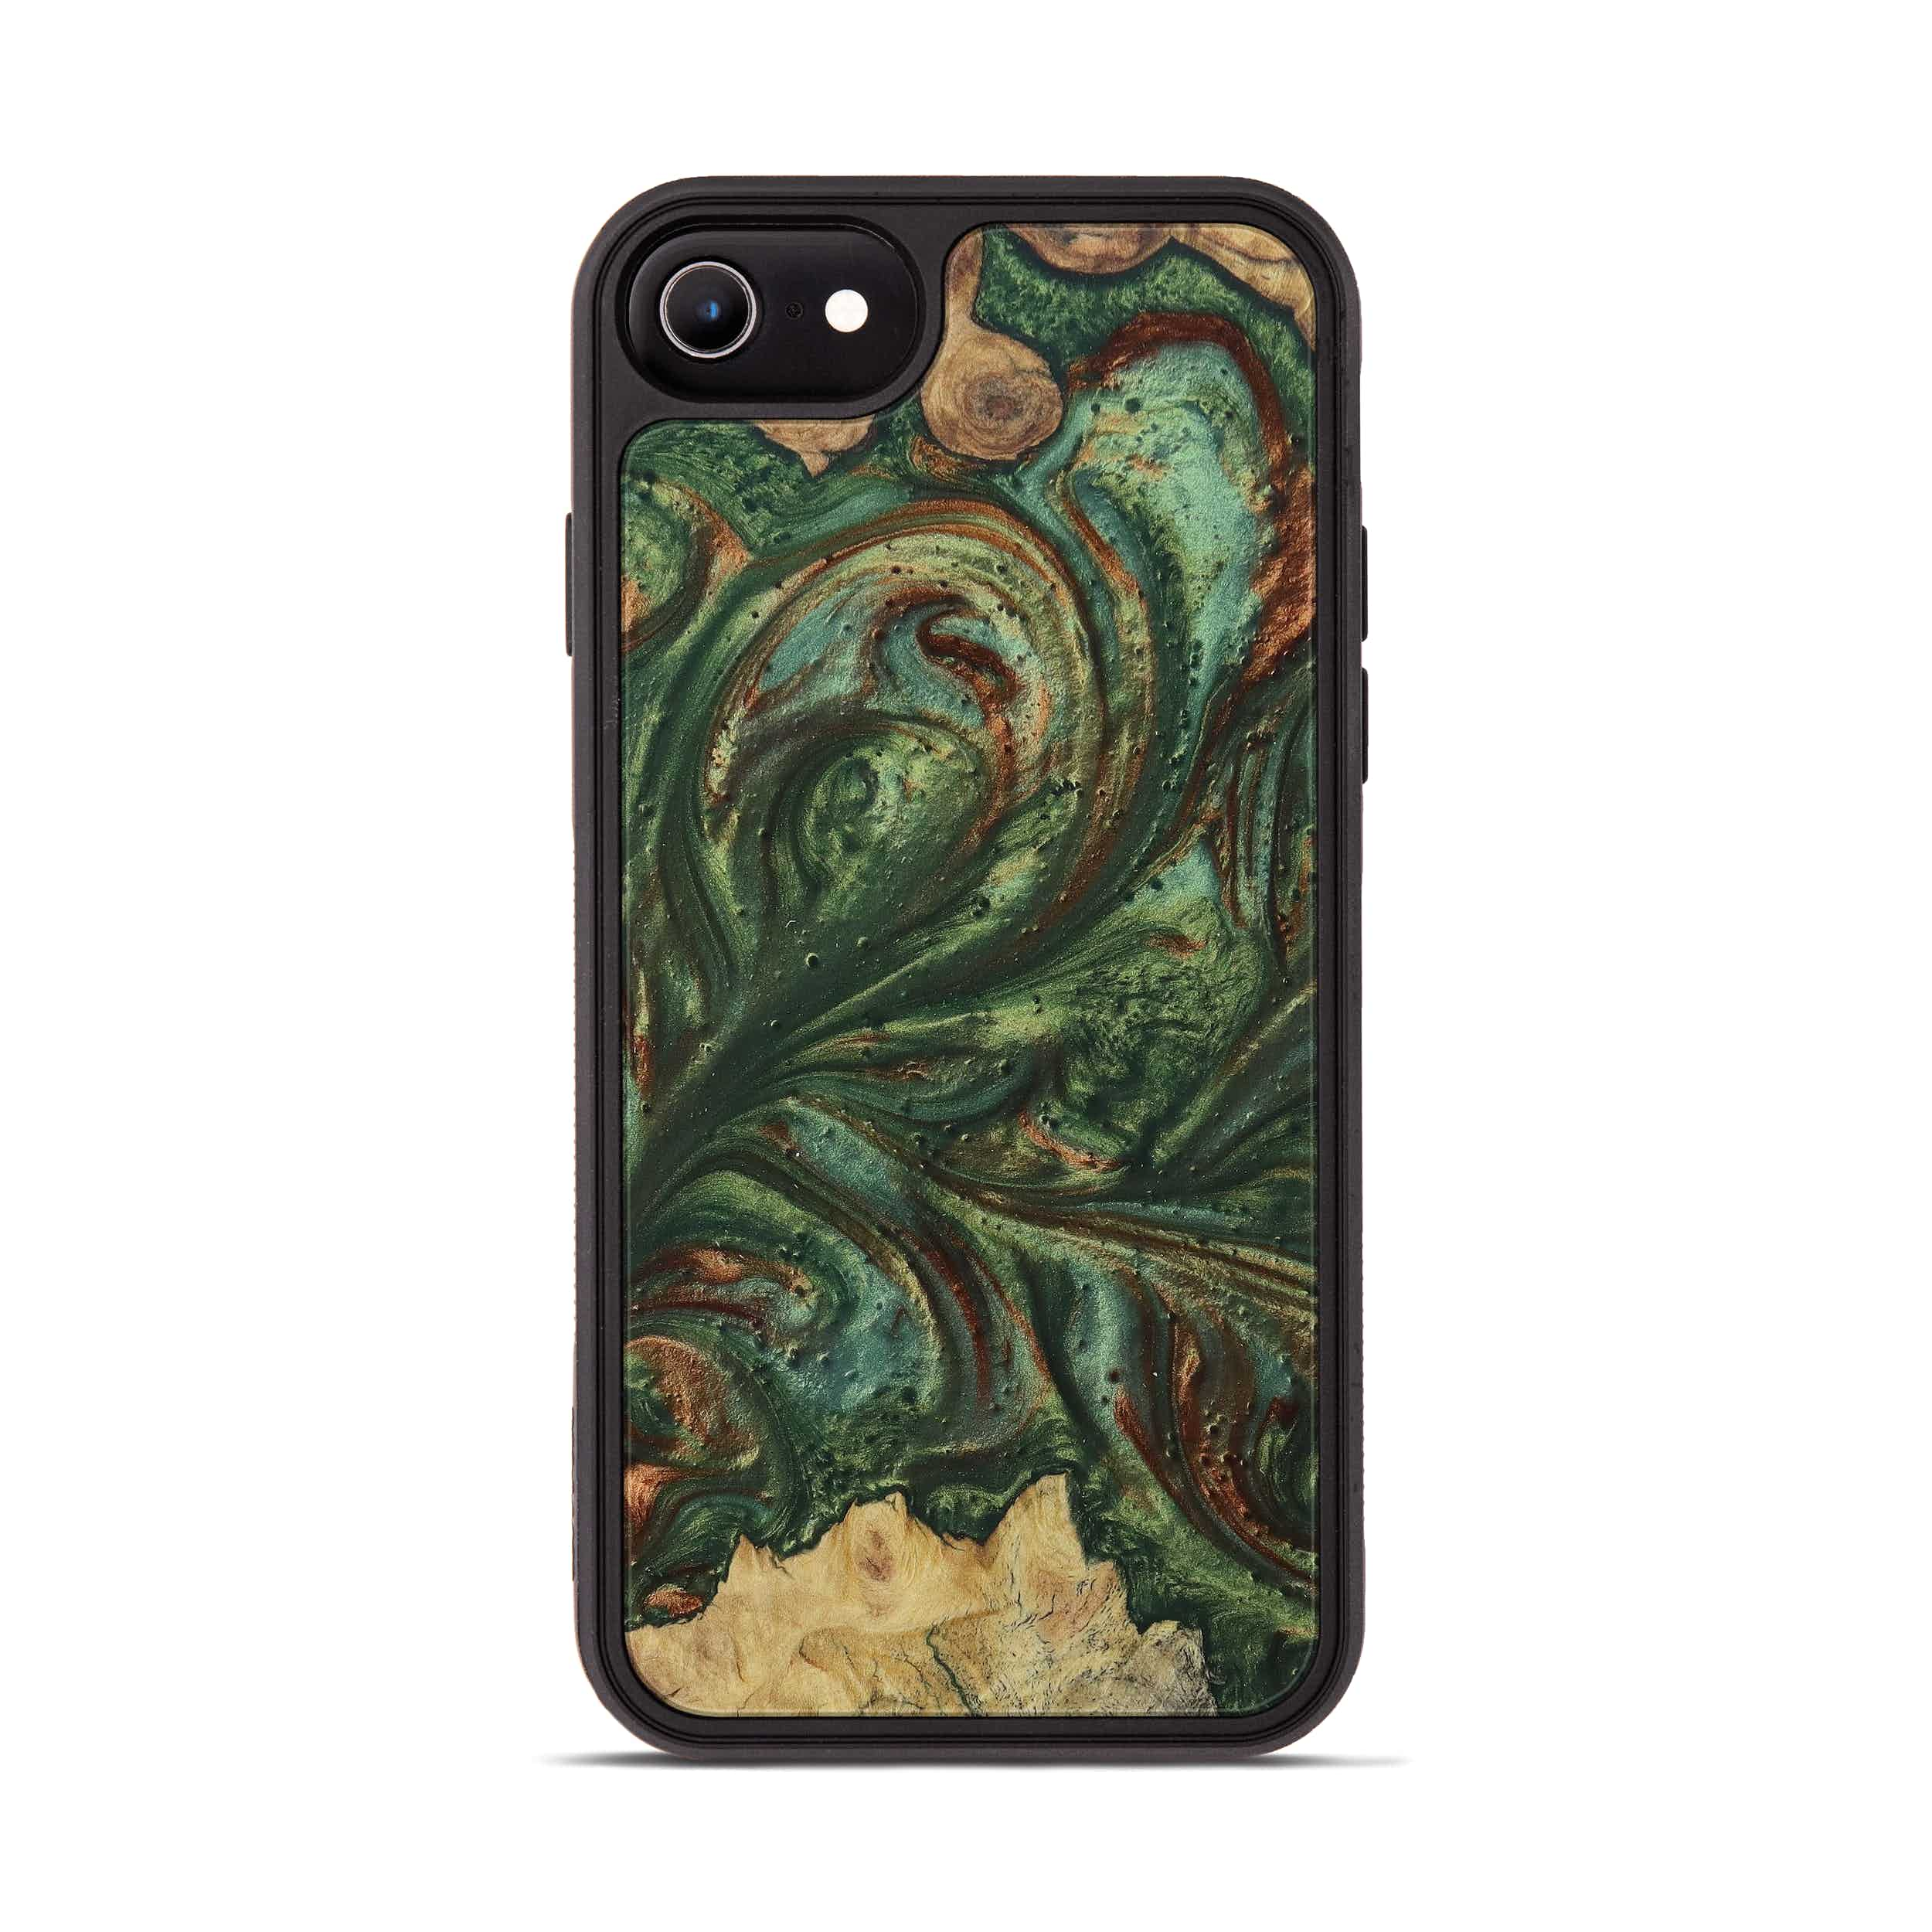 iPhone 6s Wood+Resin Phone Case - Melek (Dark Green, 395224)